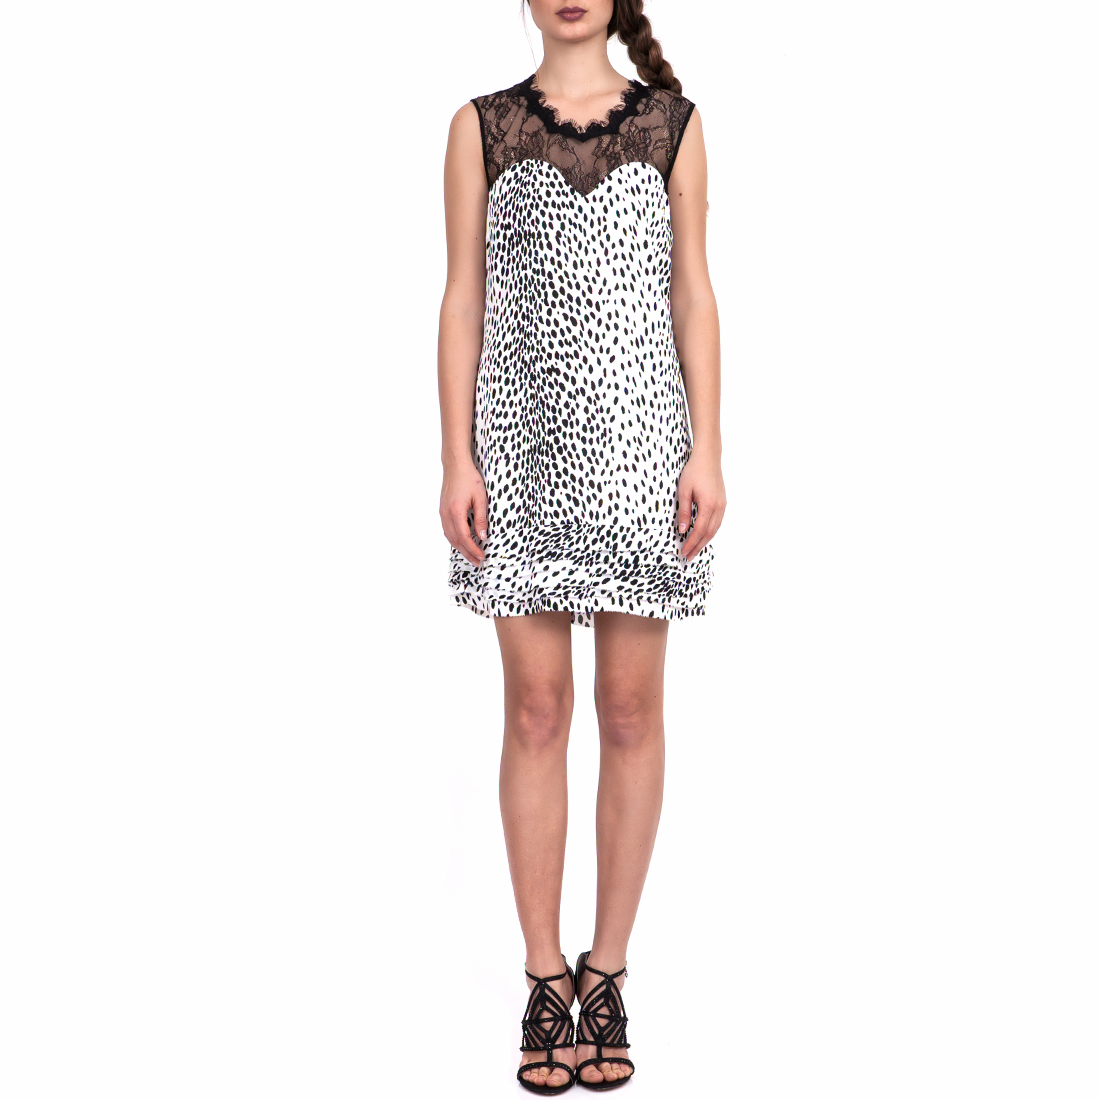 GUESS - Γυναικείο φόρεμα GUESS λευκό-μαύρο γυναικεία ρούχα φορέματα μίνι